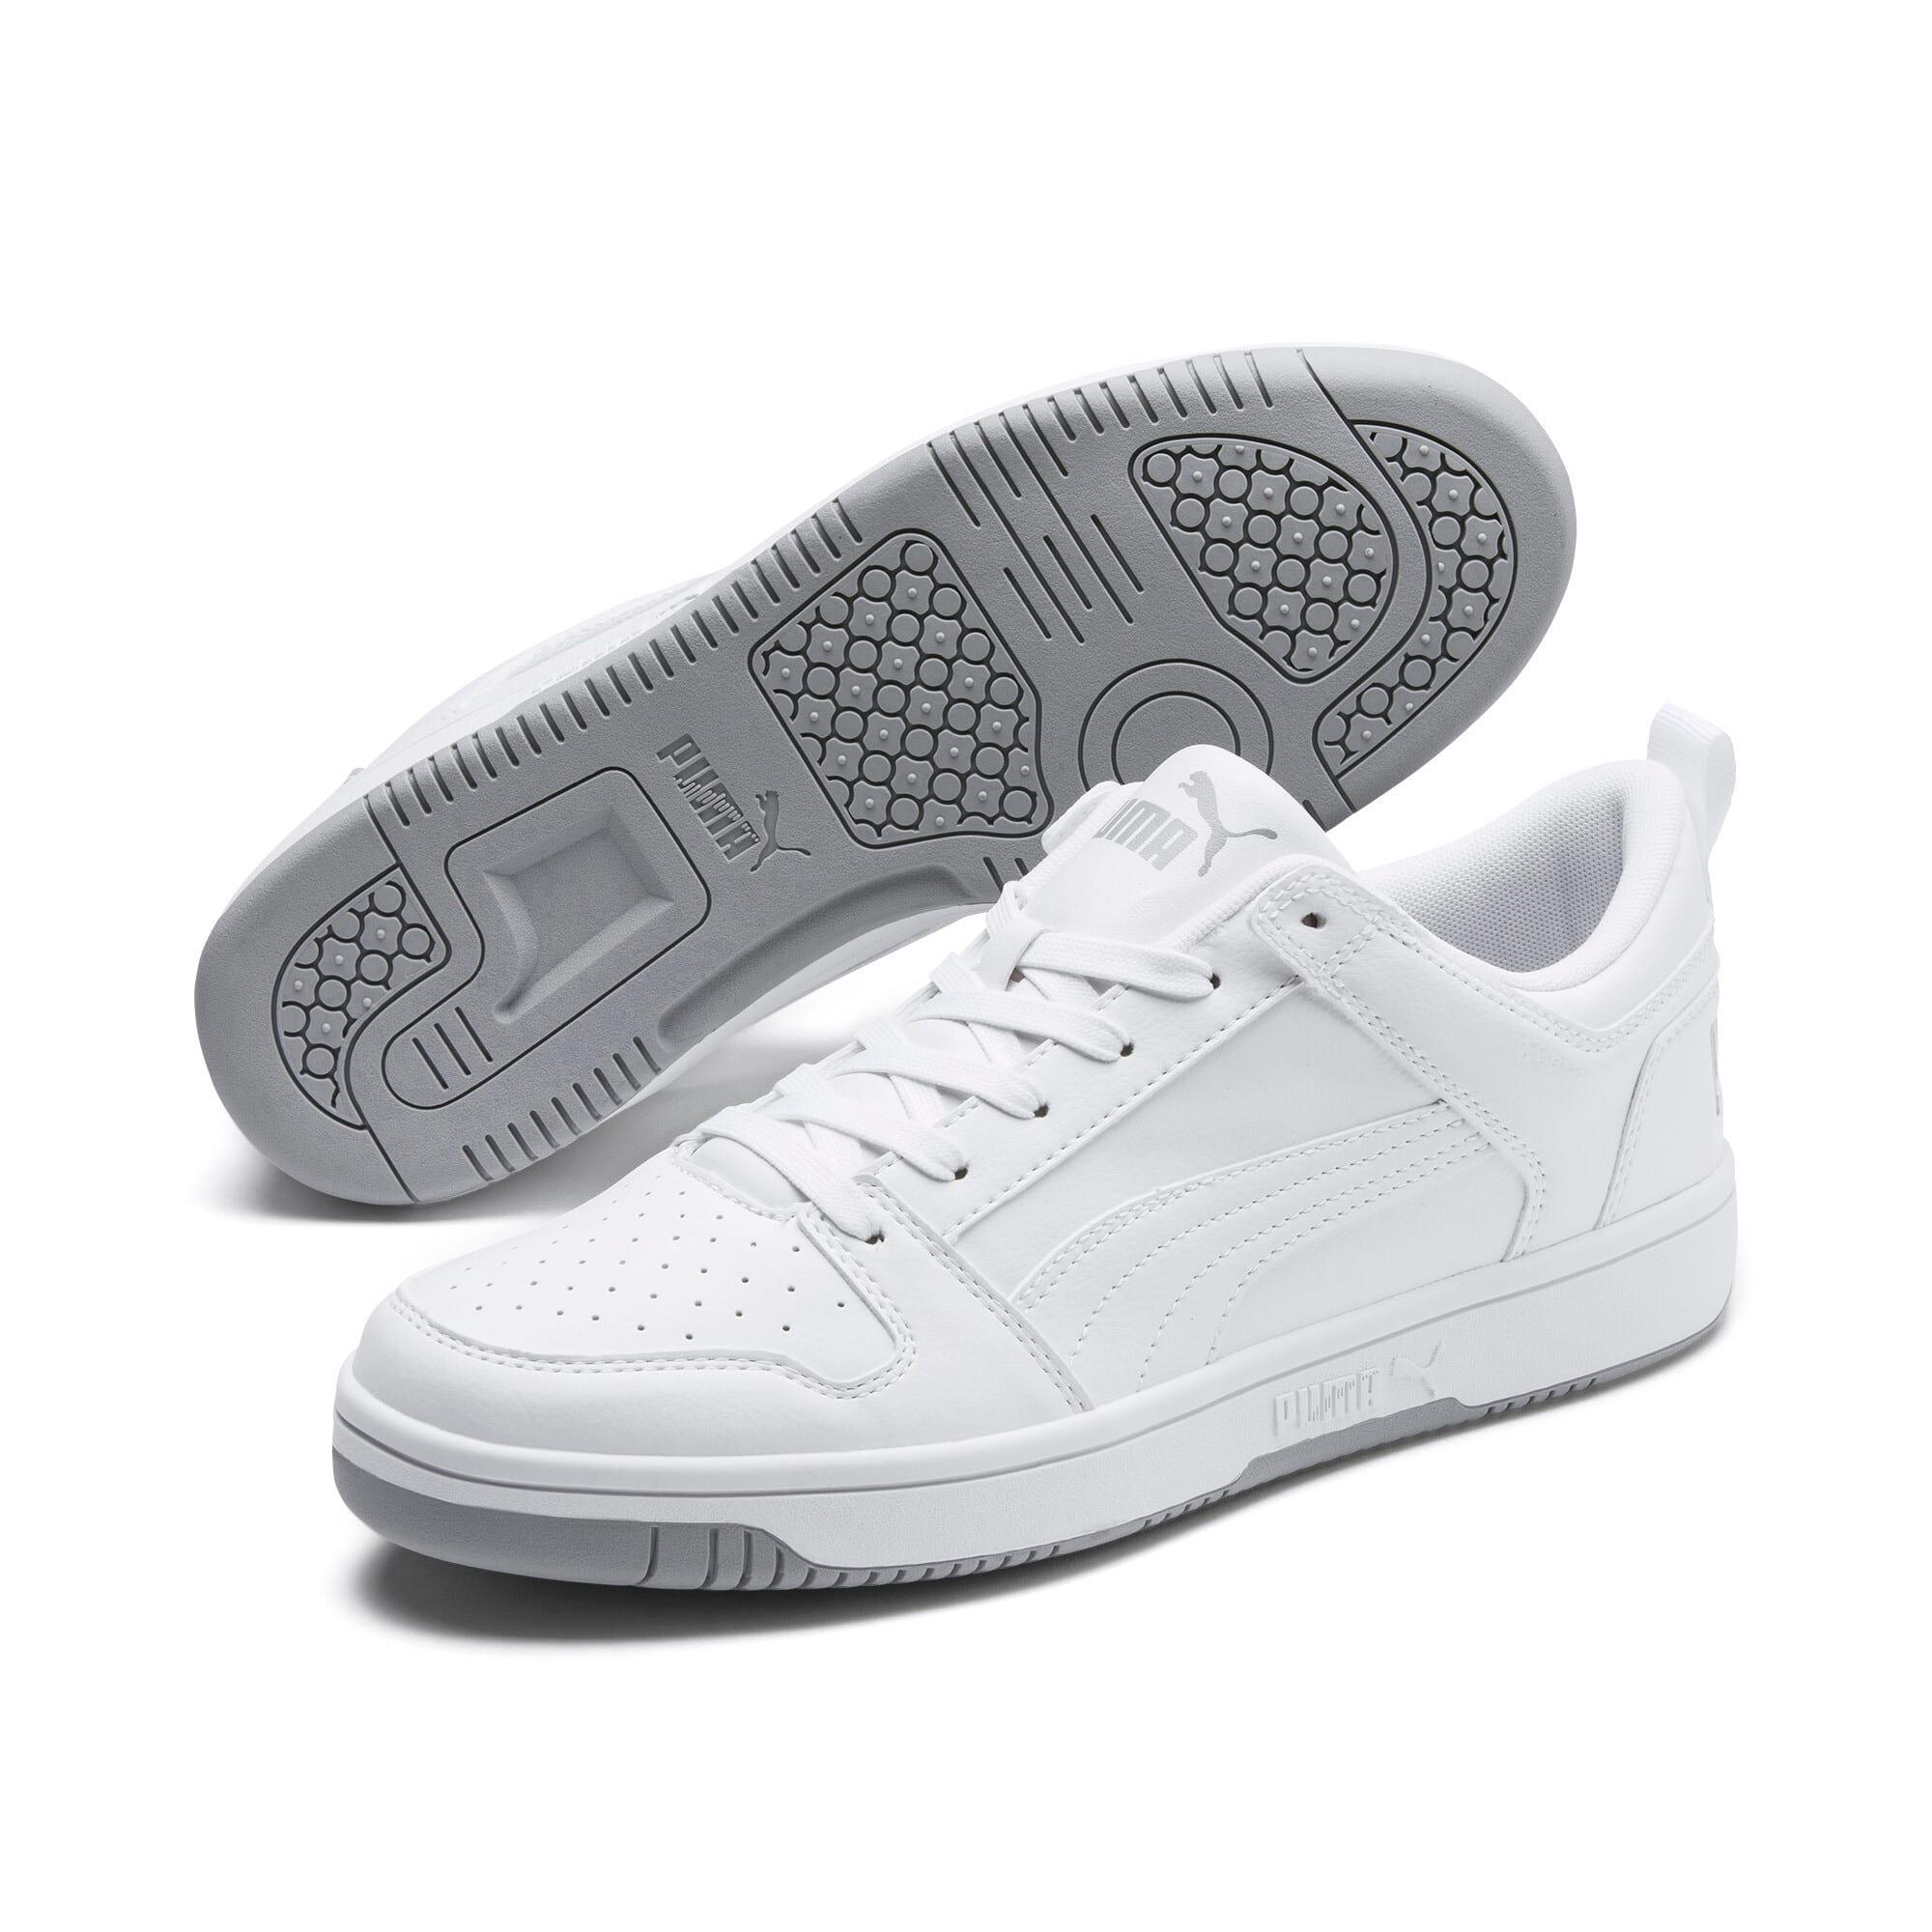 Thumbnail 3 of PUMA Rebound LayUp Lo Sneakers, Puma White-High Rise, medium